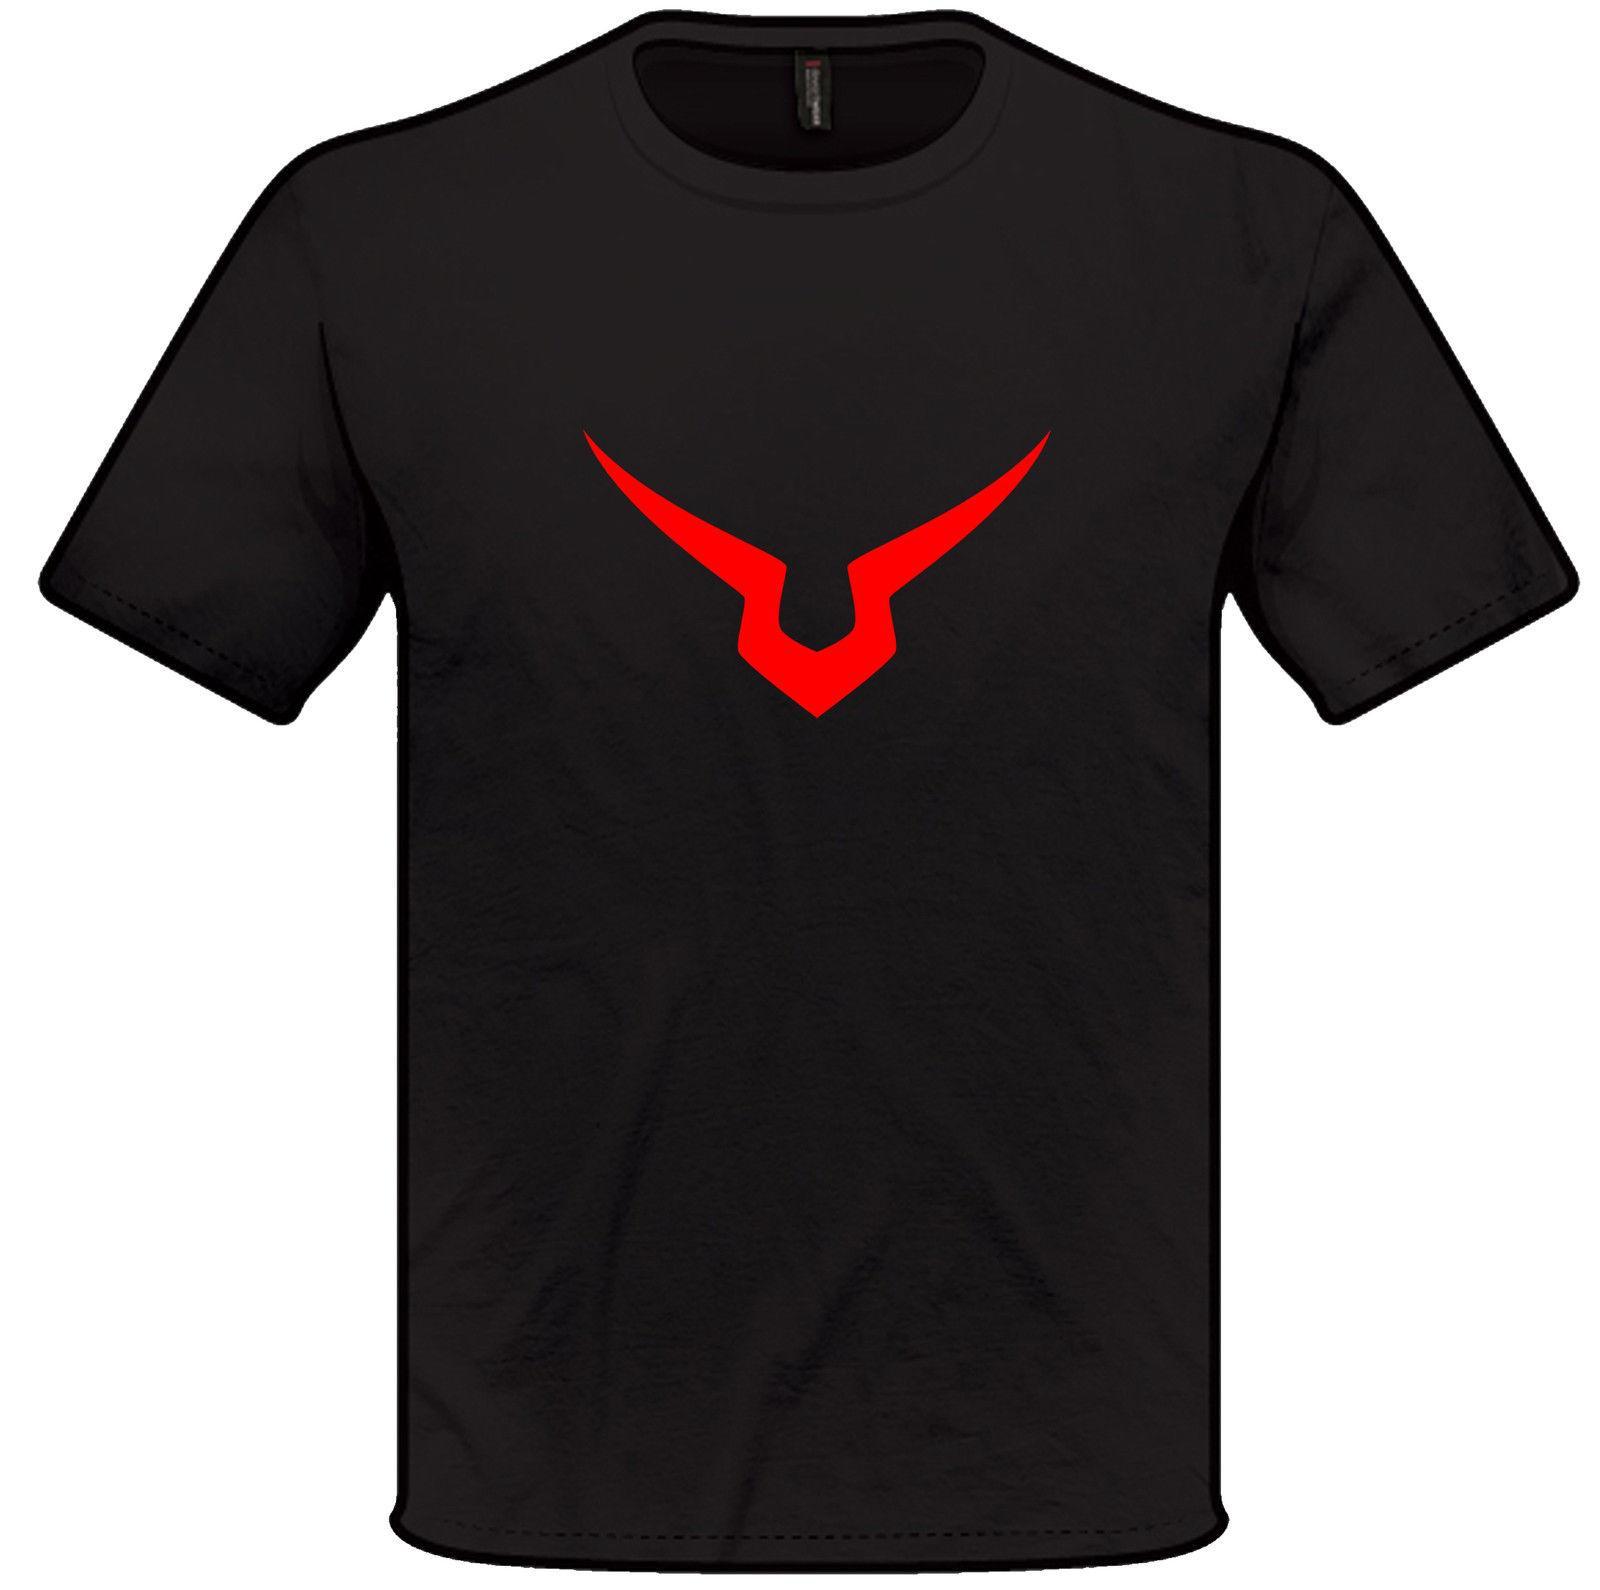 Code Geass Eye Symbol Anime T Shirt Black Knights Free Uk Pp Best